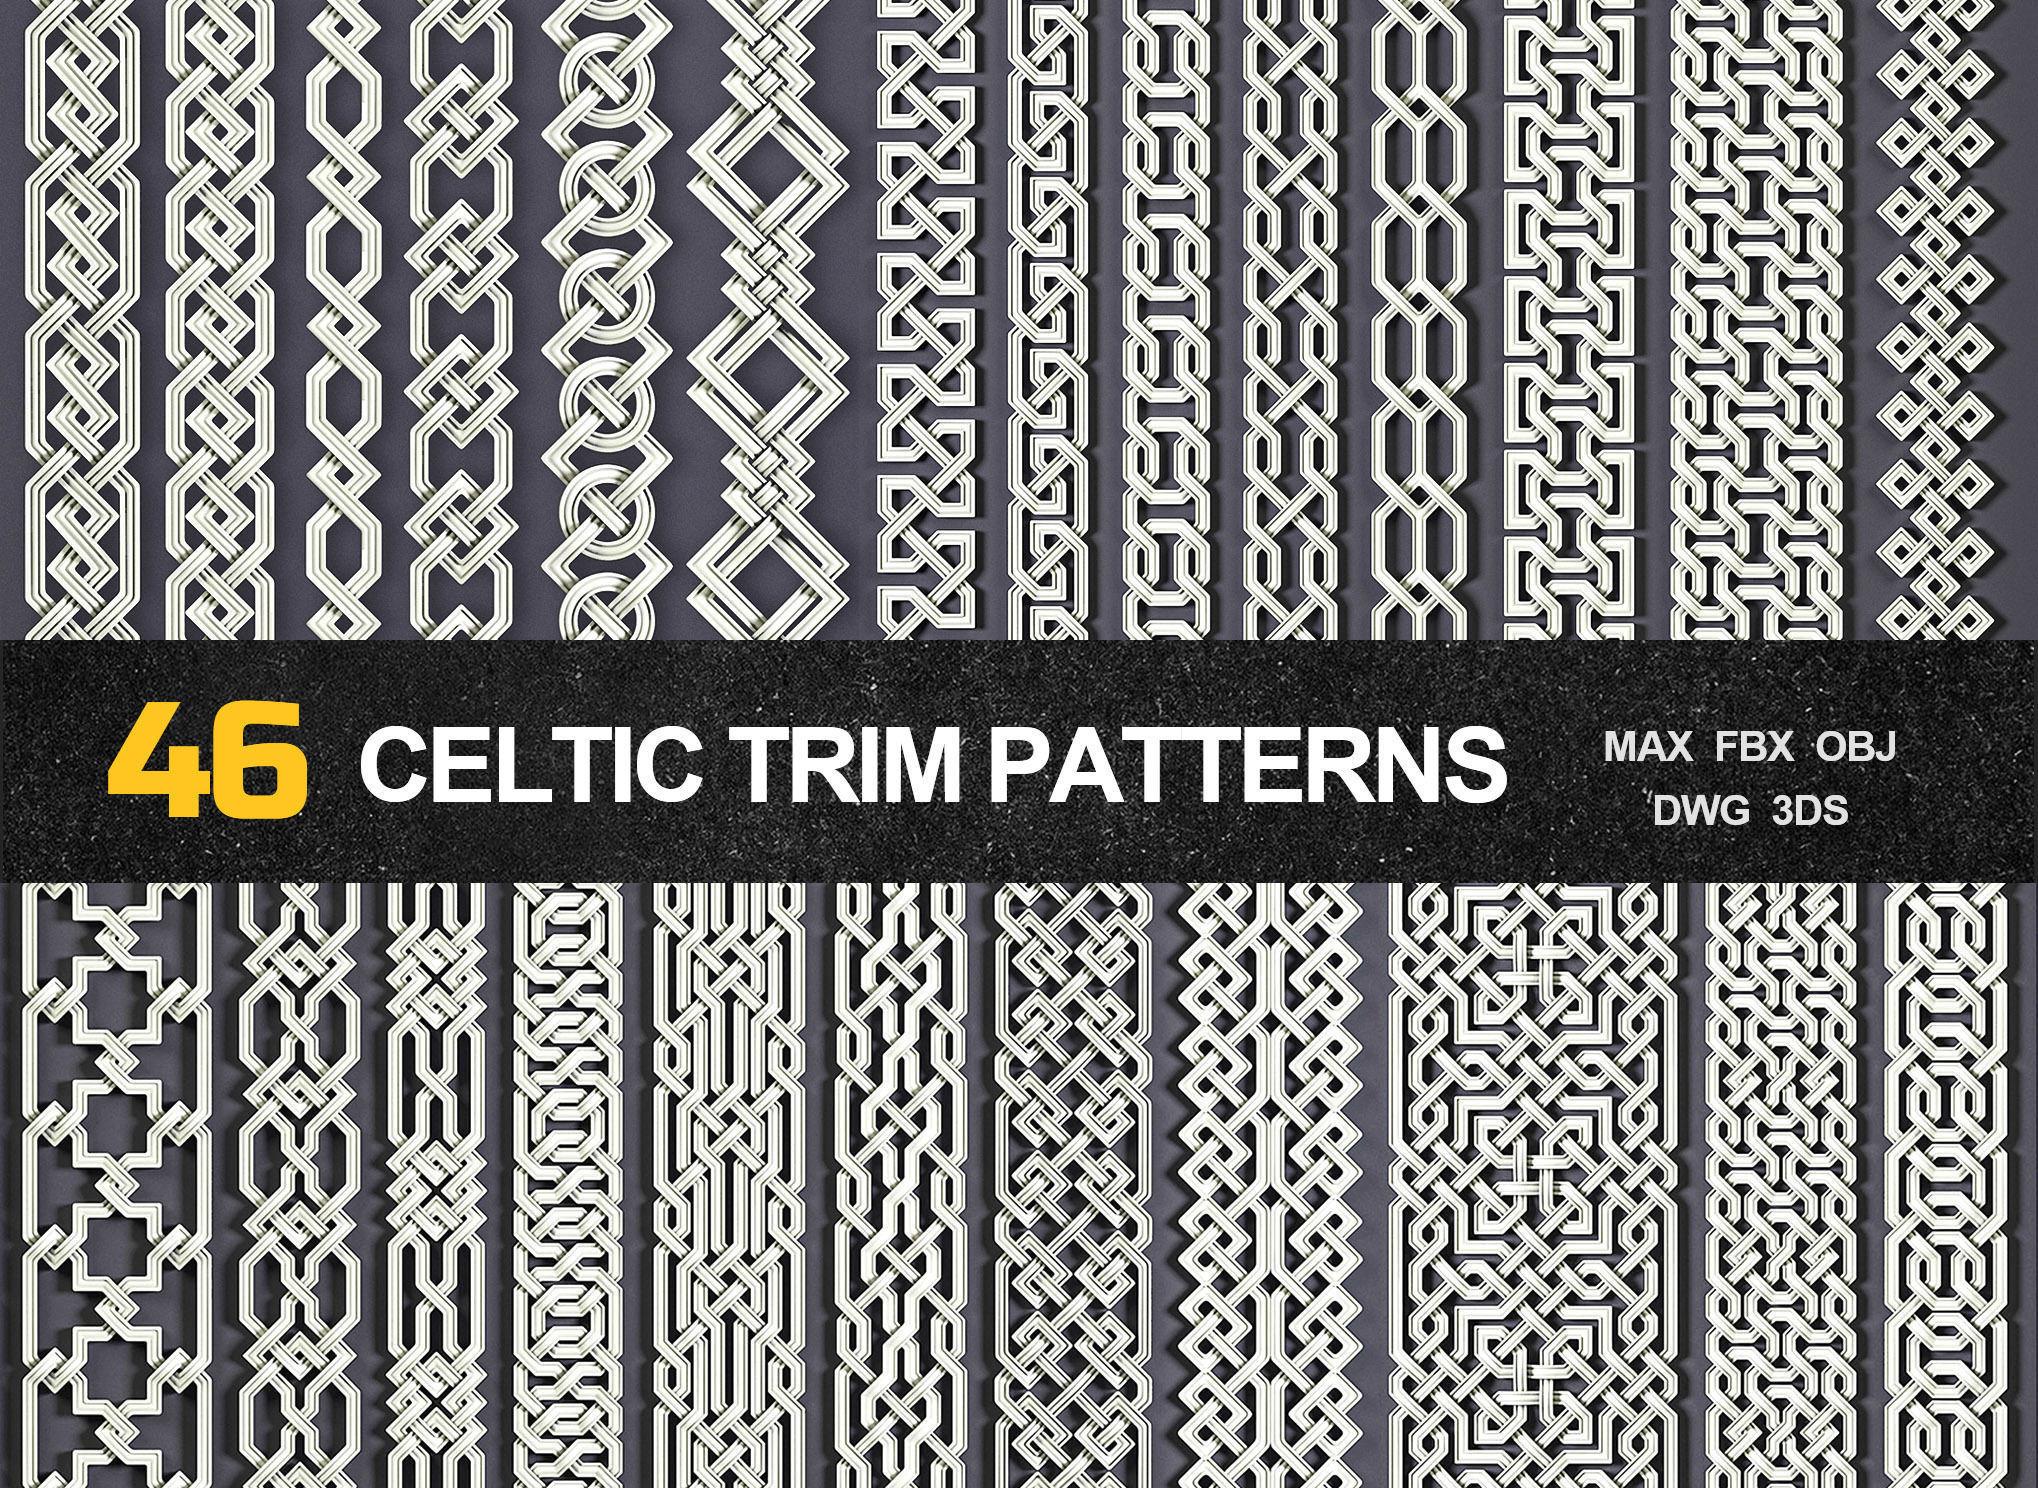 46 Celtic Trim Patterns